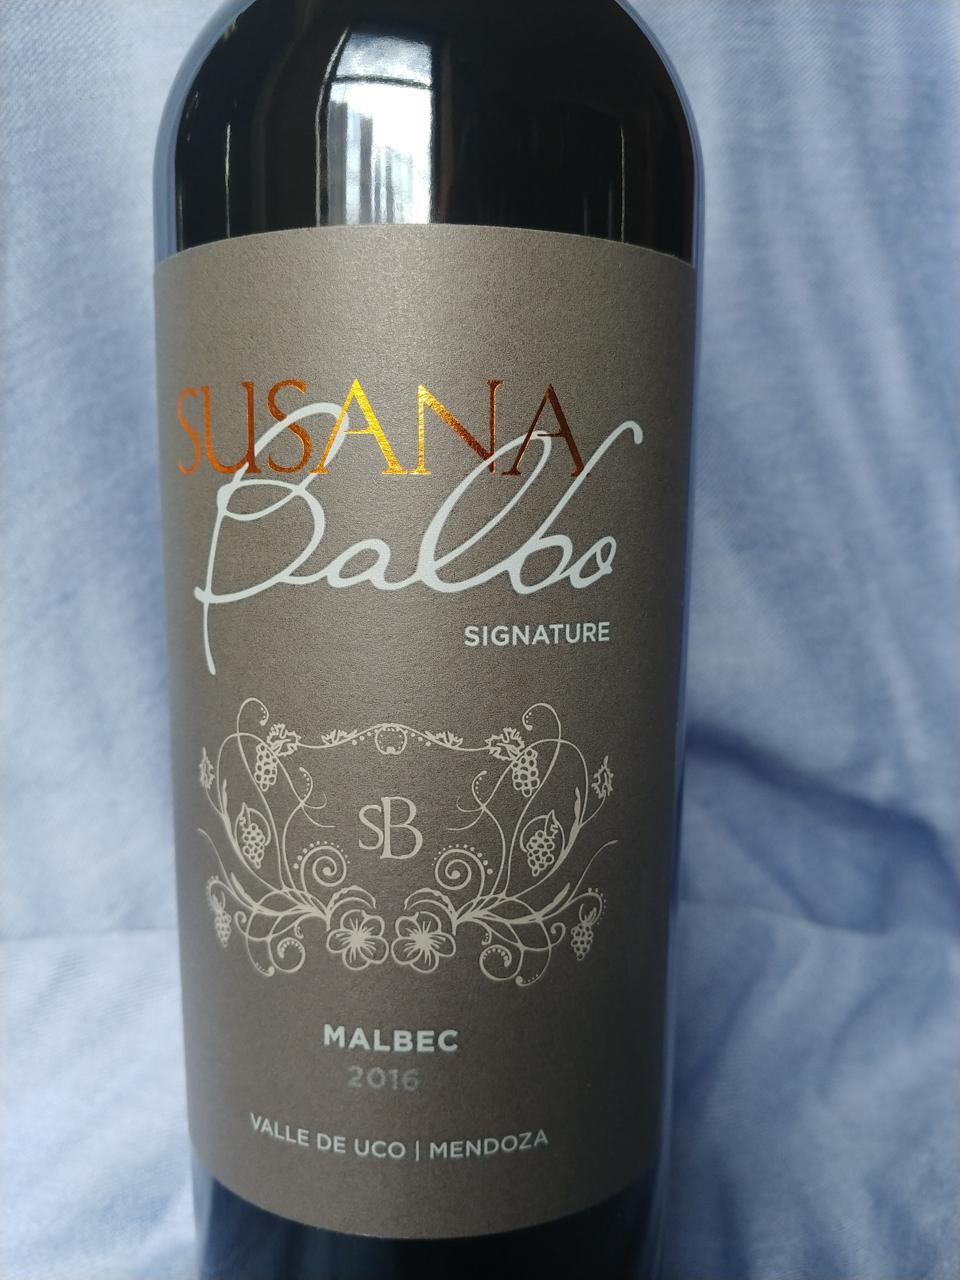 2016 Susana Balbo's Signature Malbec